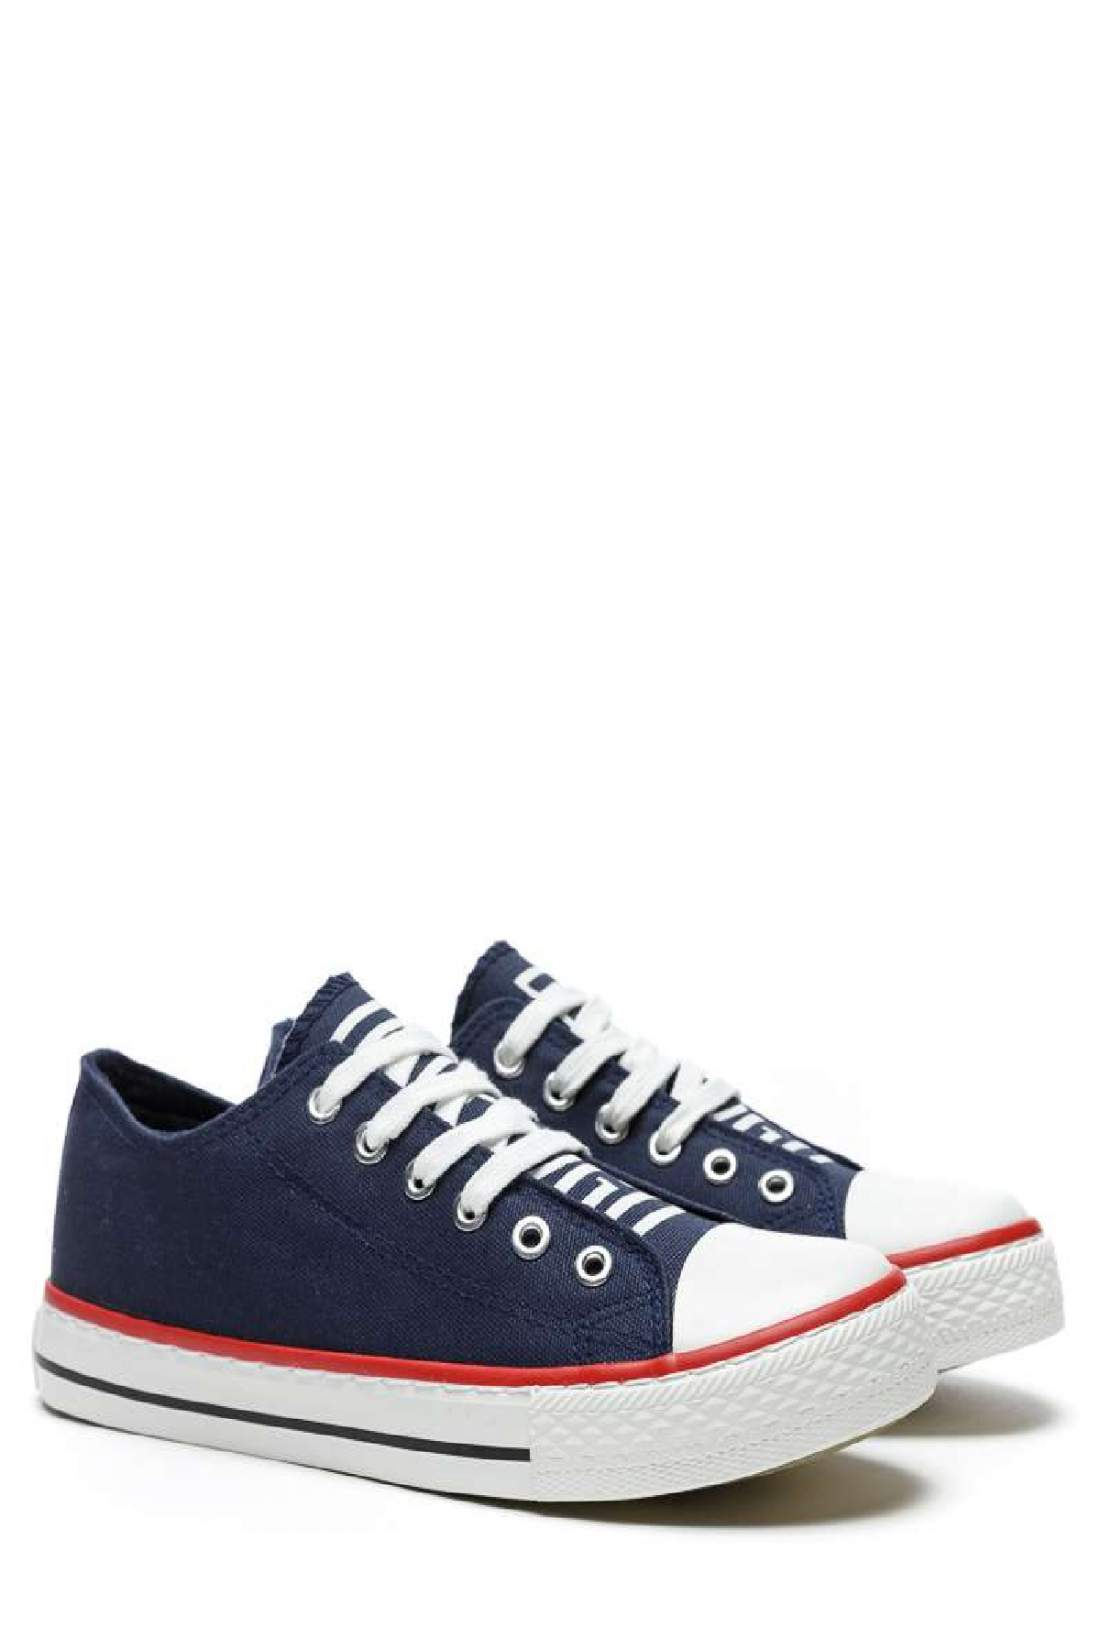 Devergo AMILLA női tornacipő - Kék